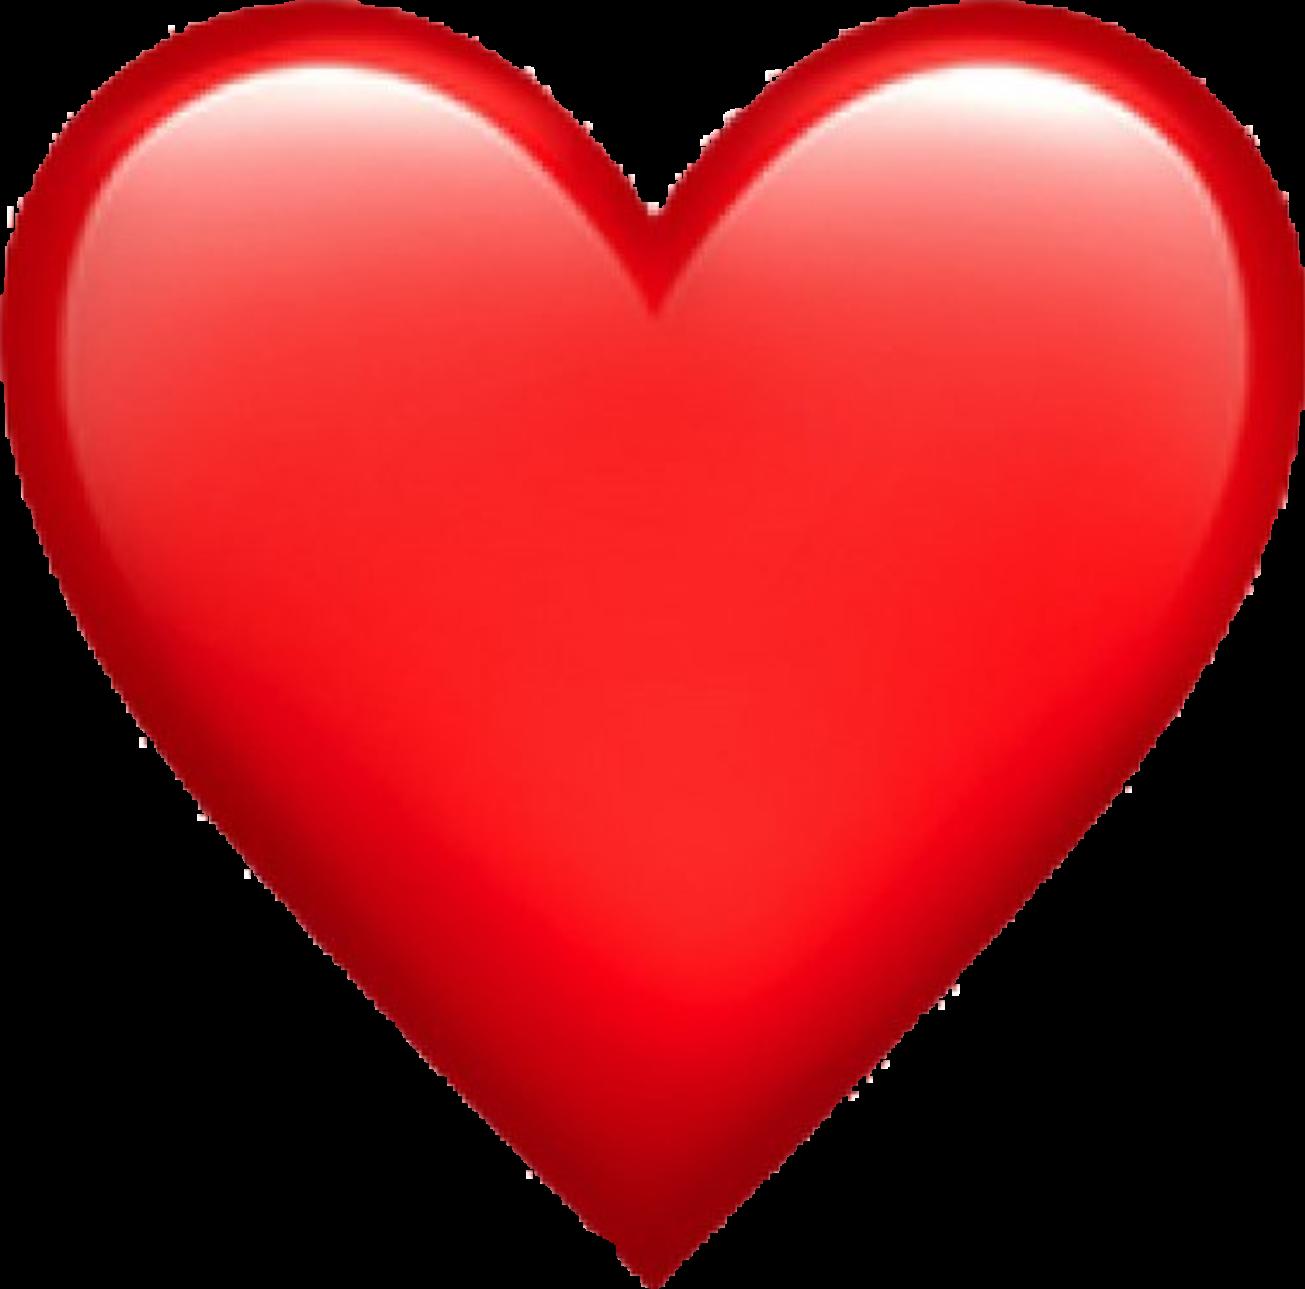 iphone herz emoji - Sticker by angelinabuhle